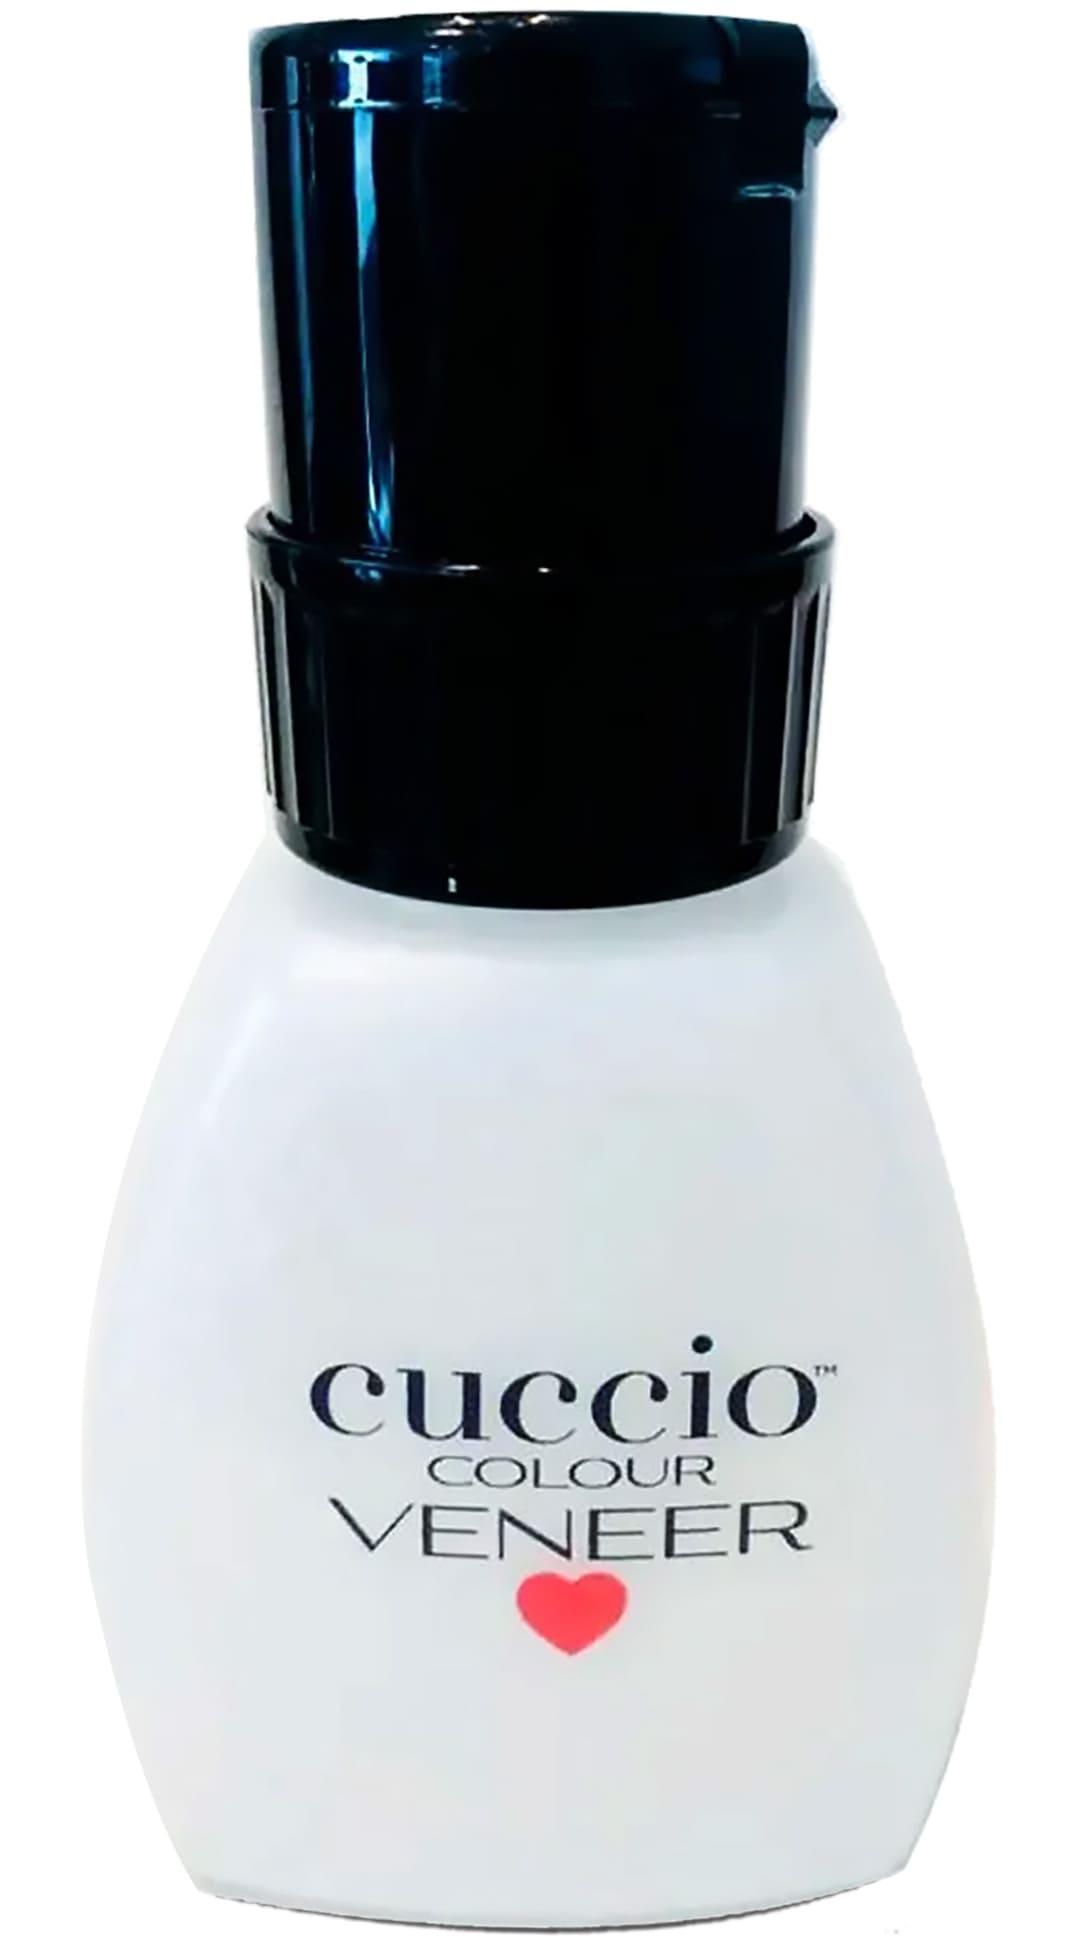 Pumper Cuccio 250 ml - Tampa Com Trava